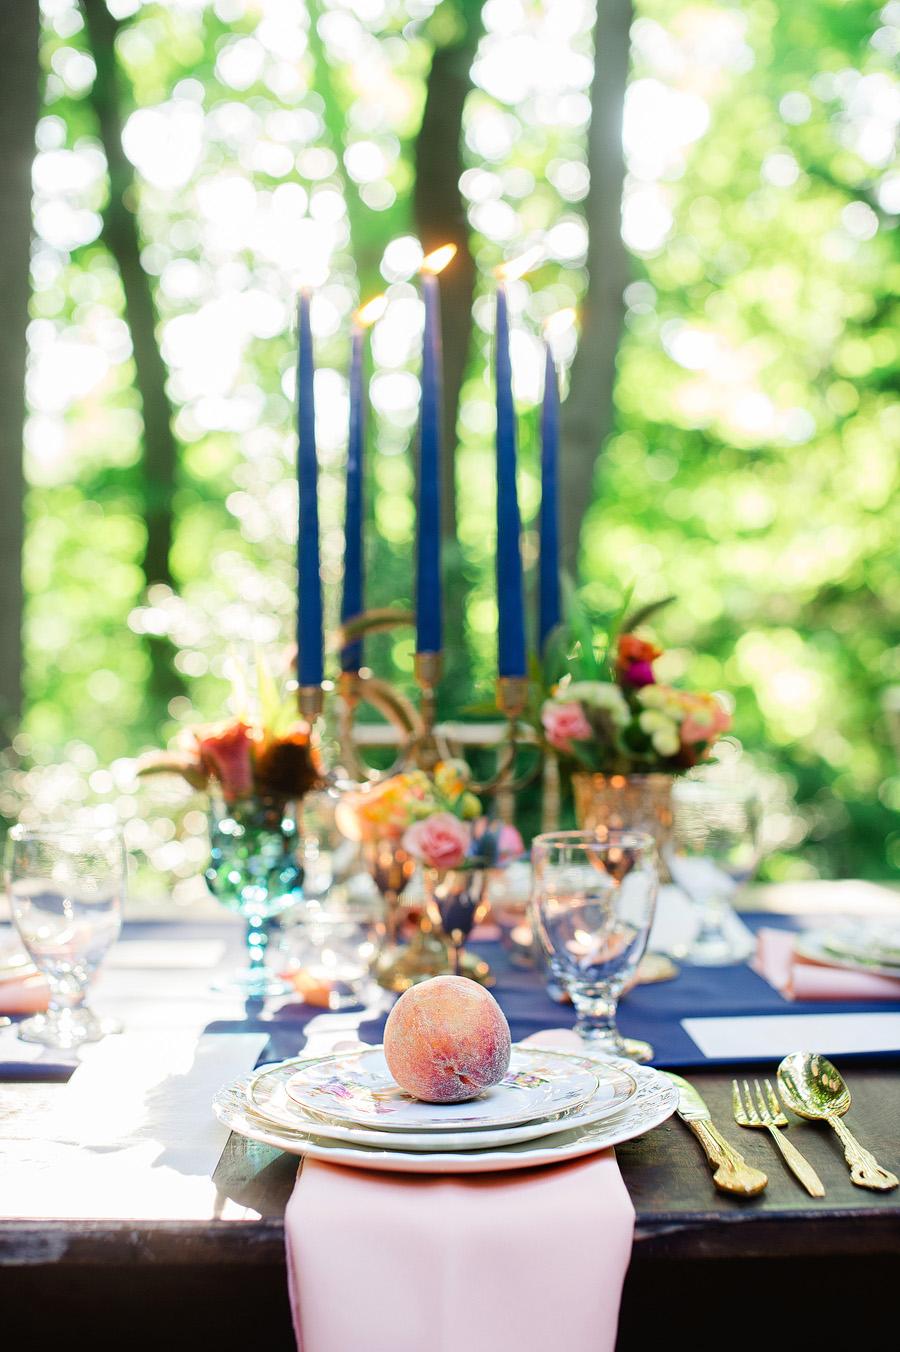 West-Chester-PA-Faunbrook-Harvest-Dinner-Series-Peach-AlexandraWhitney-138.jpg